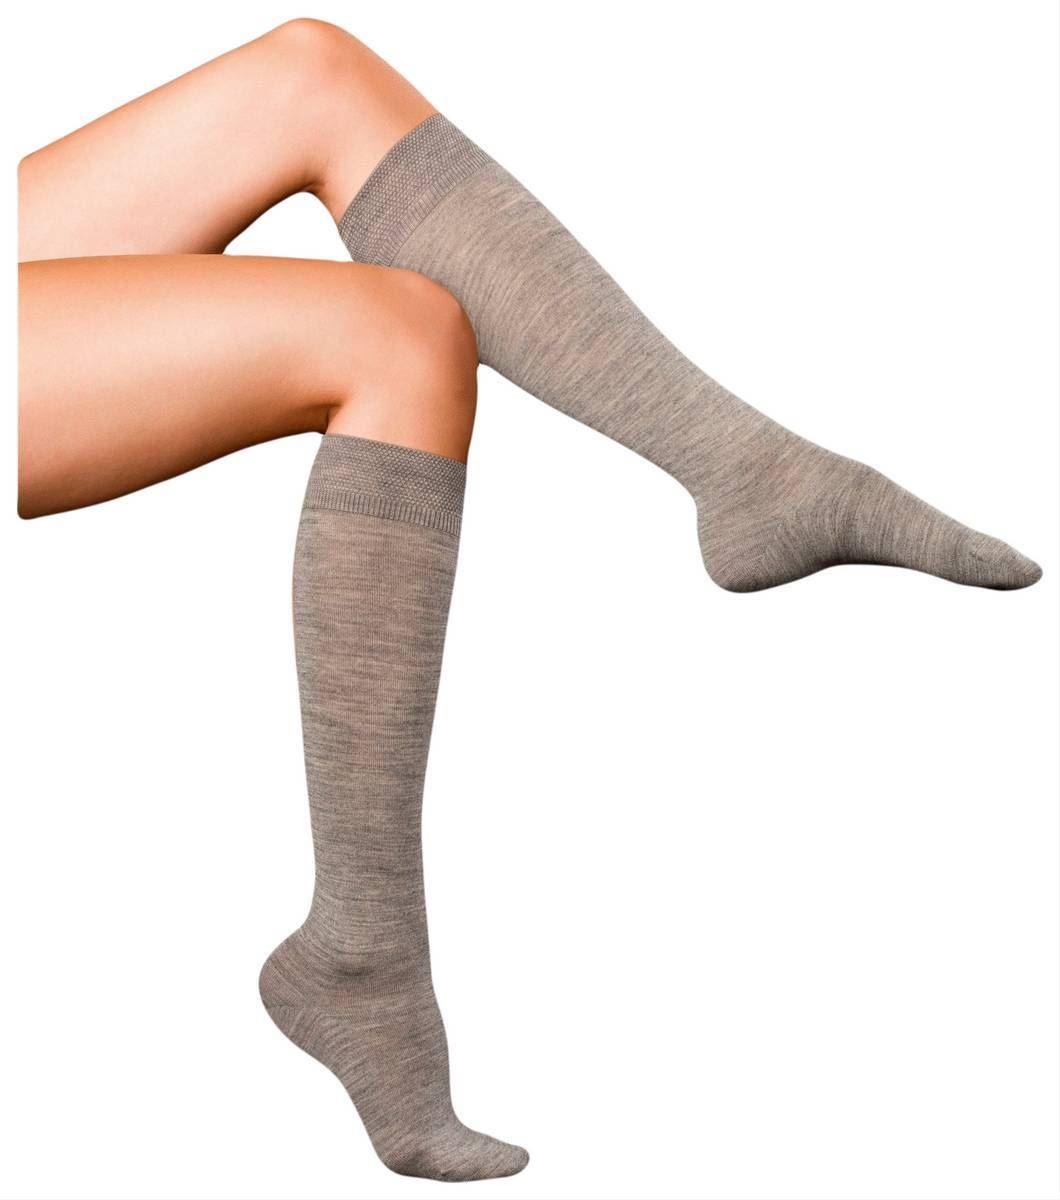 fd37849a322 Falke Womens Finest No3 Merino and Silk Knee High Socks - Light Grey Melange